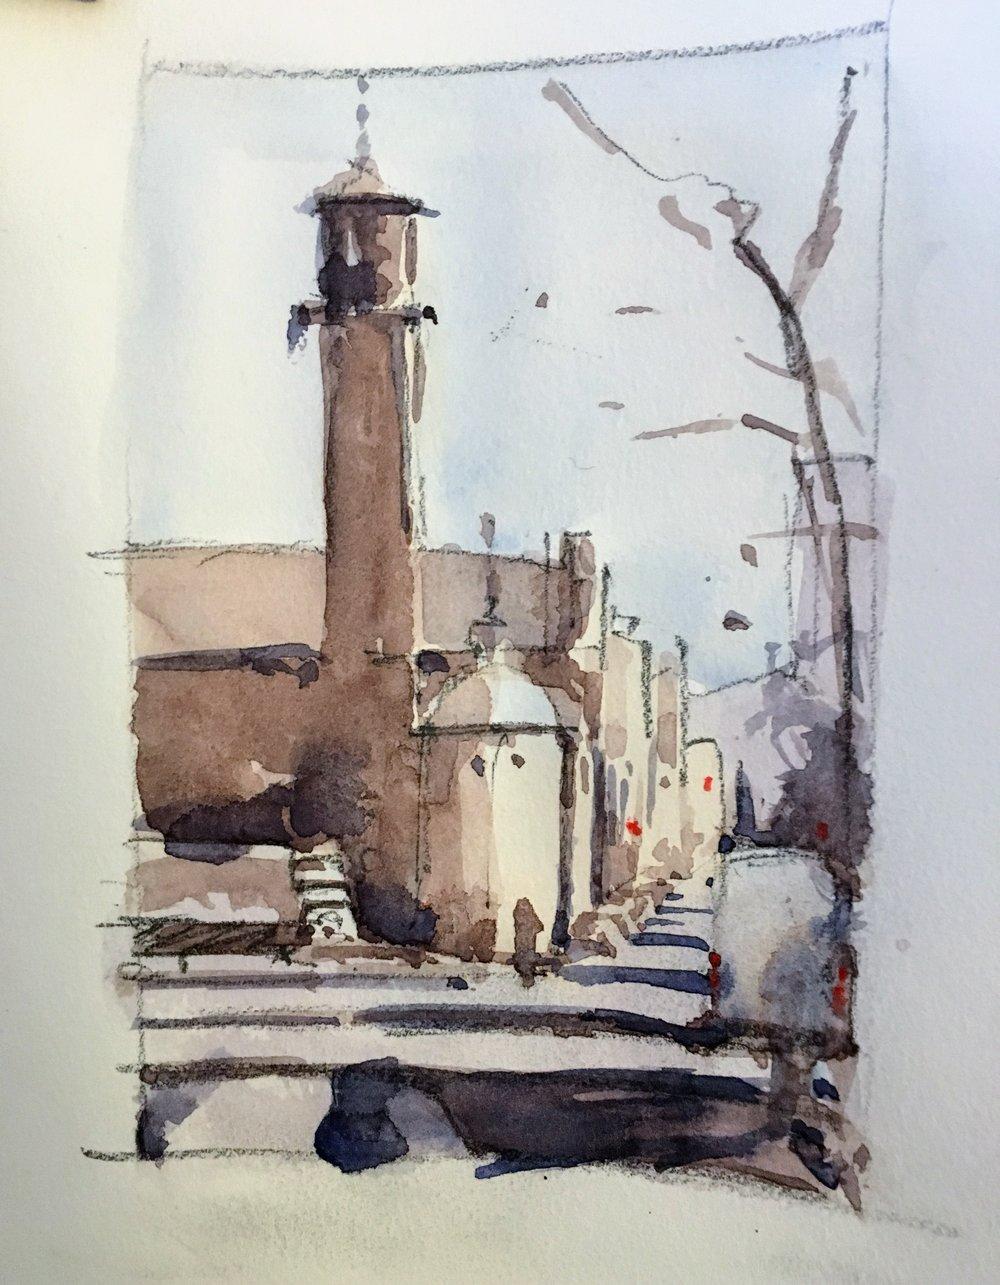 mt_auburn_st_cambridge_watercolor_sketch